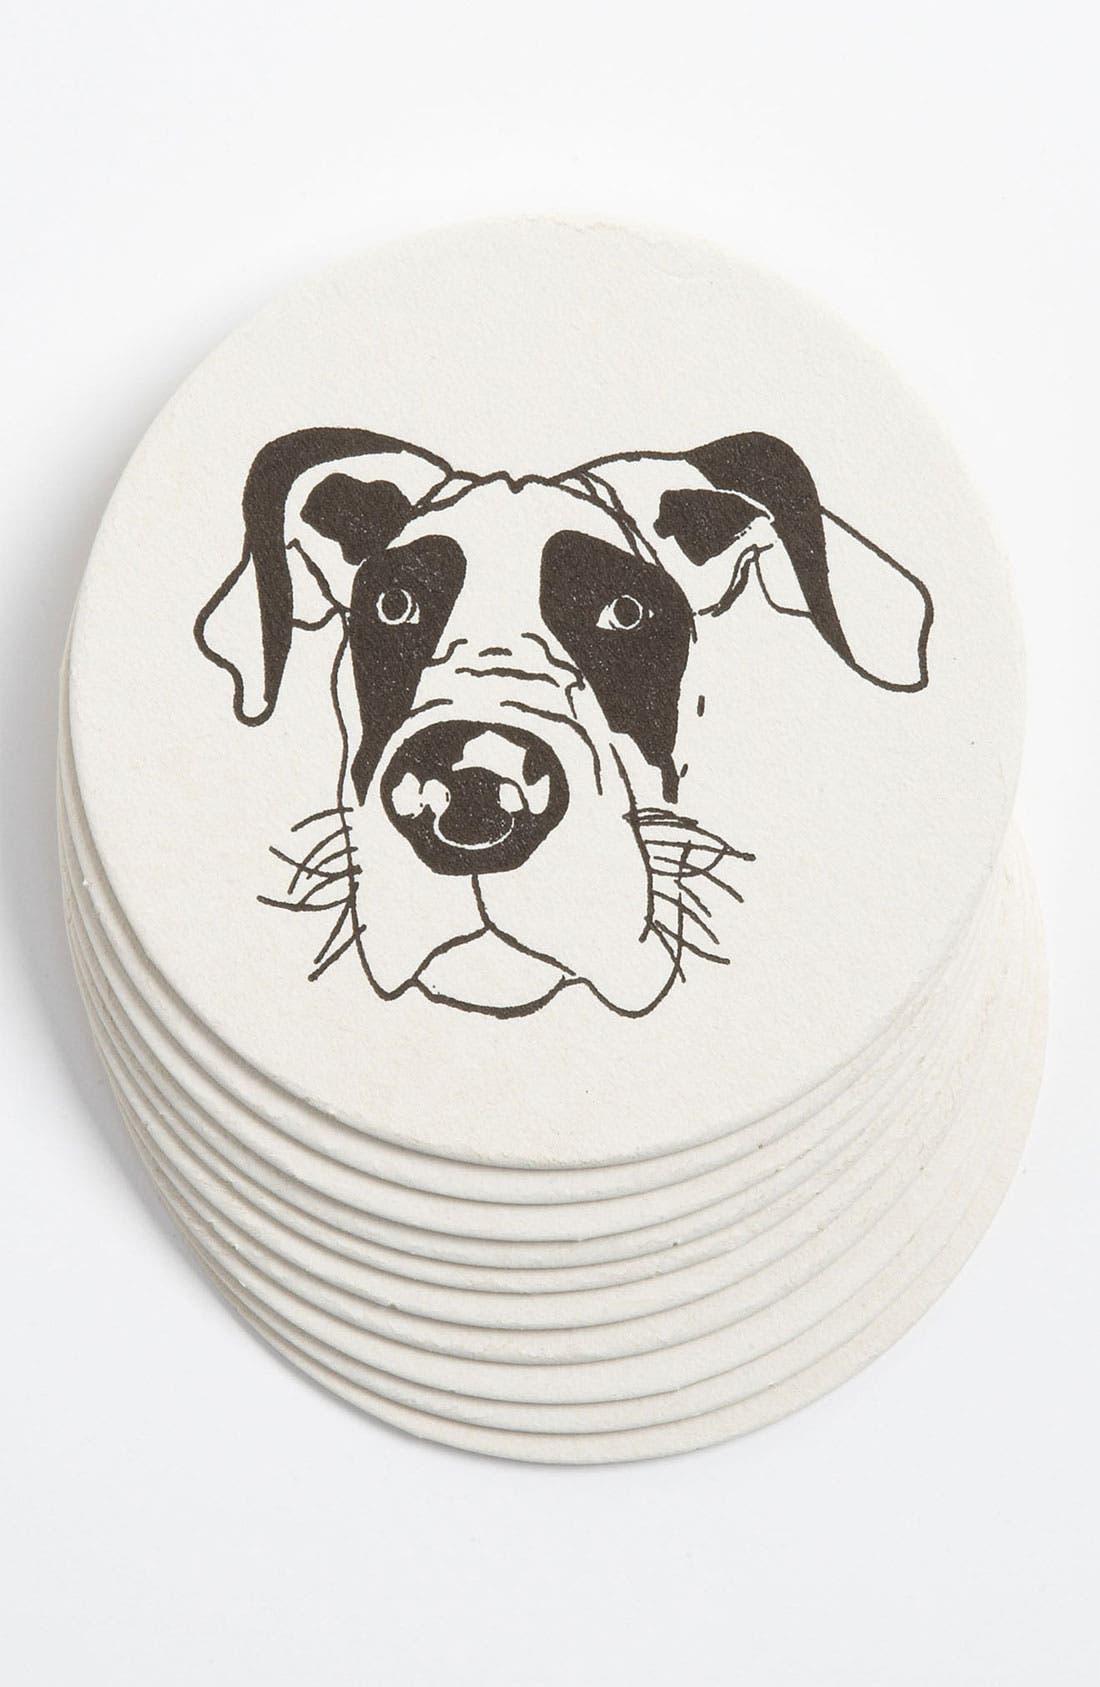 Main Image - 'Great Dane' Letterpress Coasters (Set of 10)